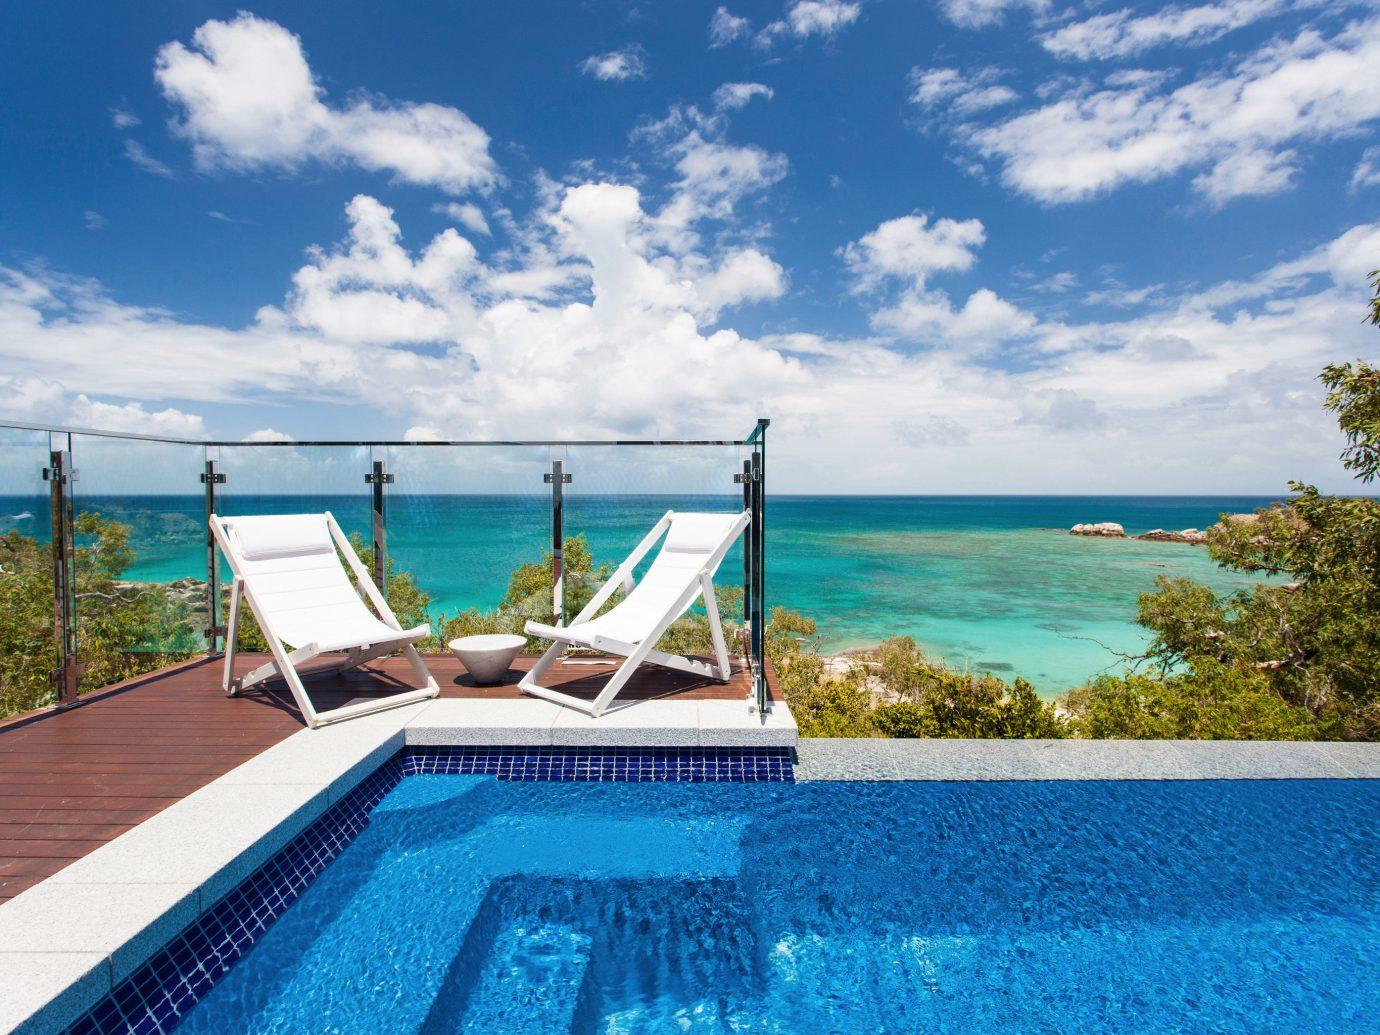 Trip Ideas sky water outdoor swimming pool property leisure caribbean vacation Sea Ocean estate Resort Villa bay Lagoon blue day